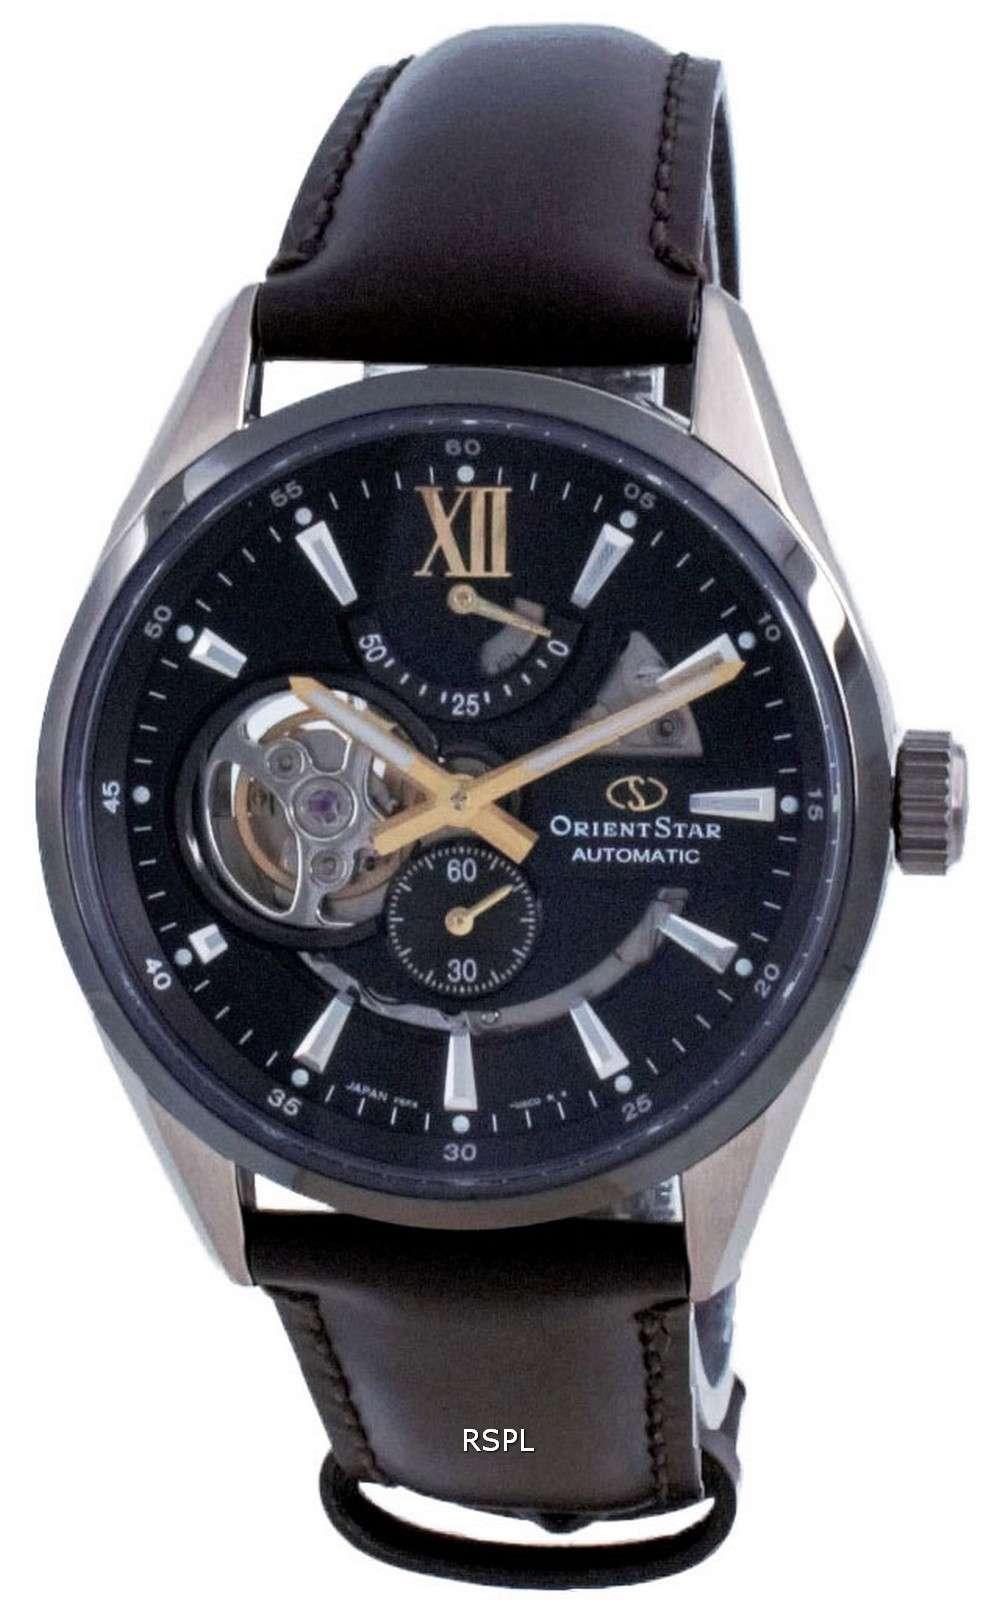 Orient Star Contemporary Open Heart Automatic RE-AV0115B00B 100M Reloj para hombre